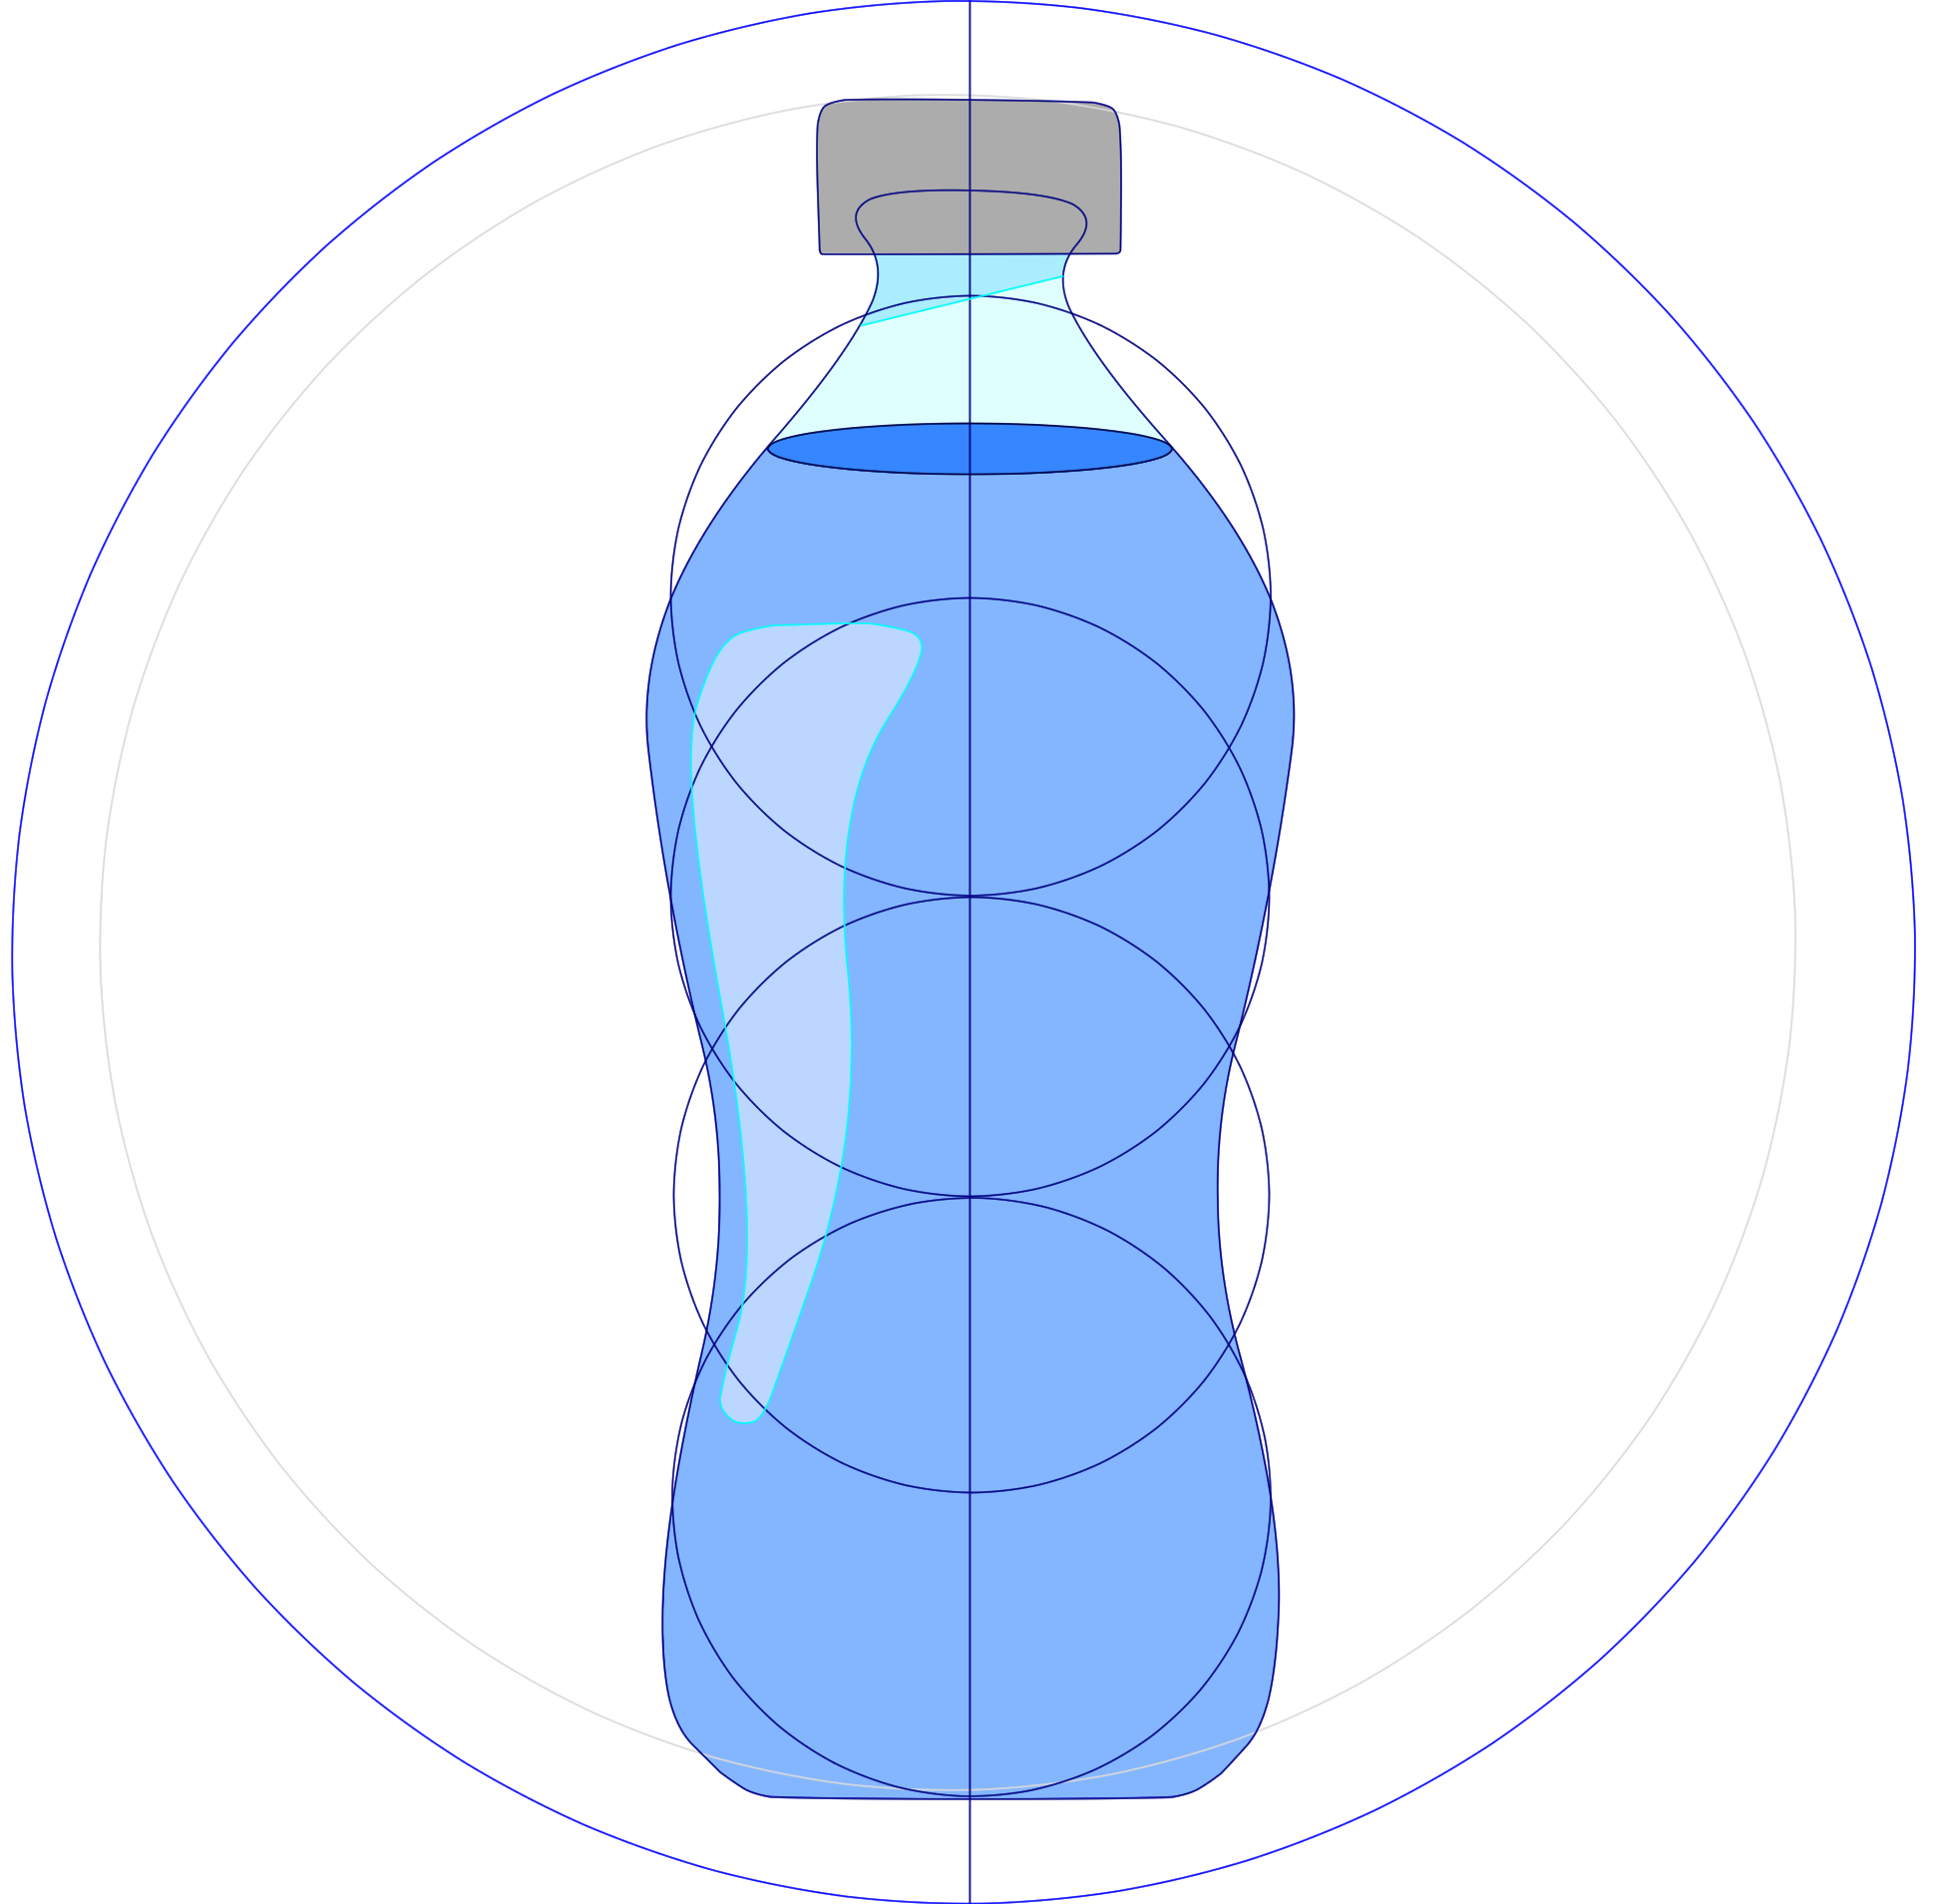 Distilled logo breakdown